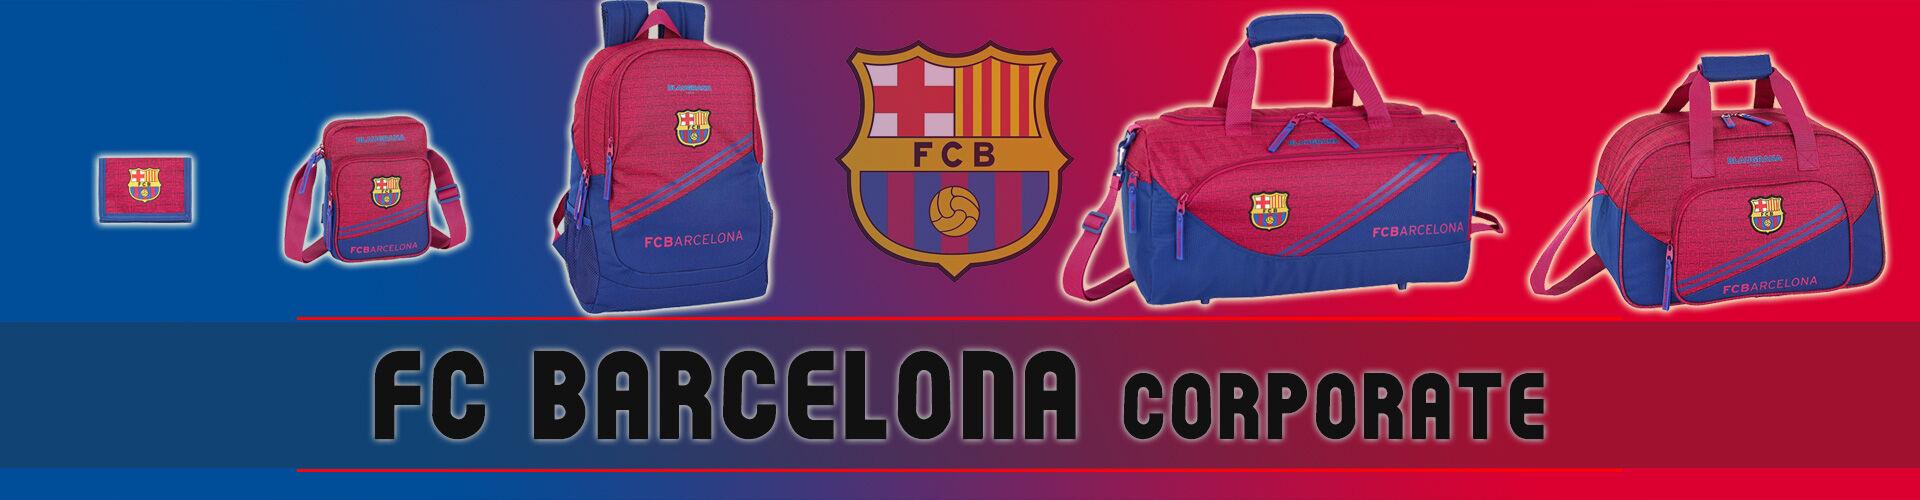 FCB CORPORATE